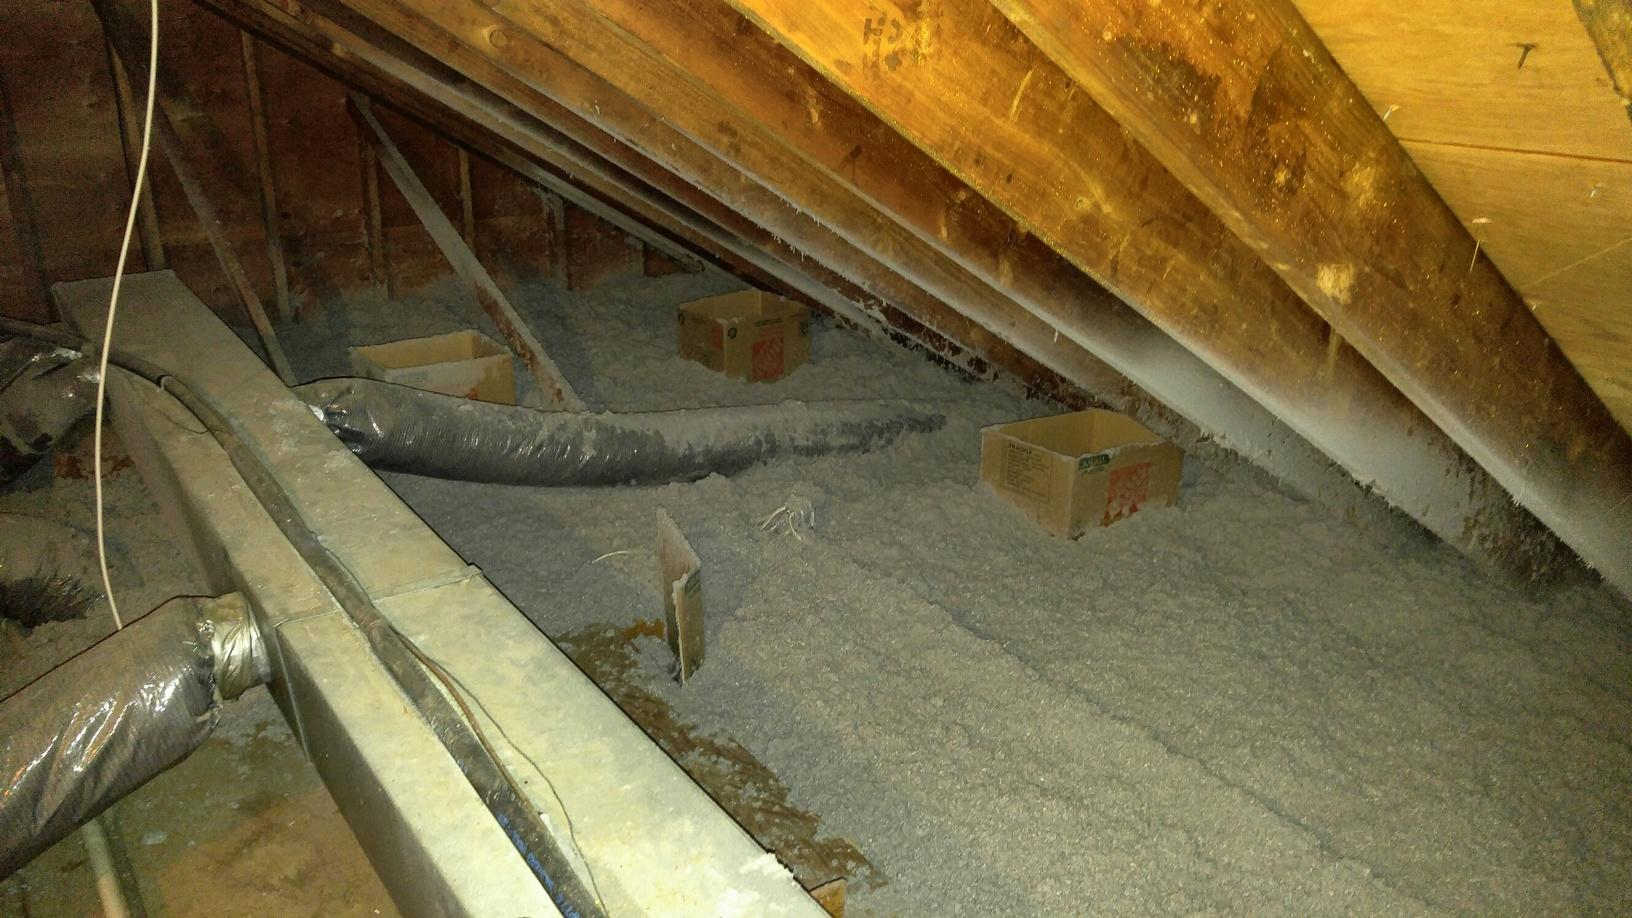 Bats soil attic insulation in Homdel, NJ - After Photo